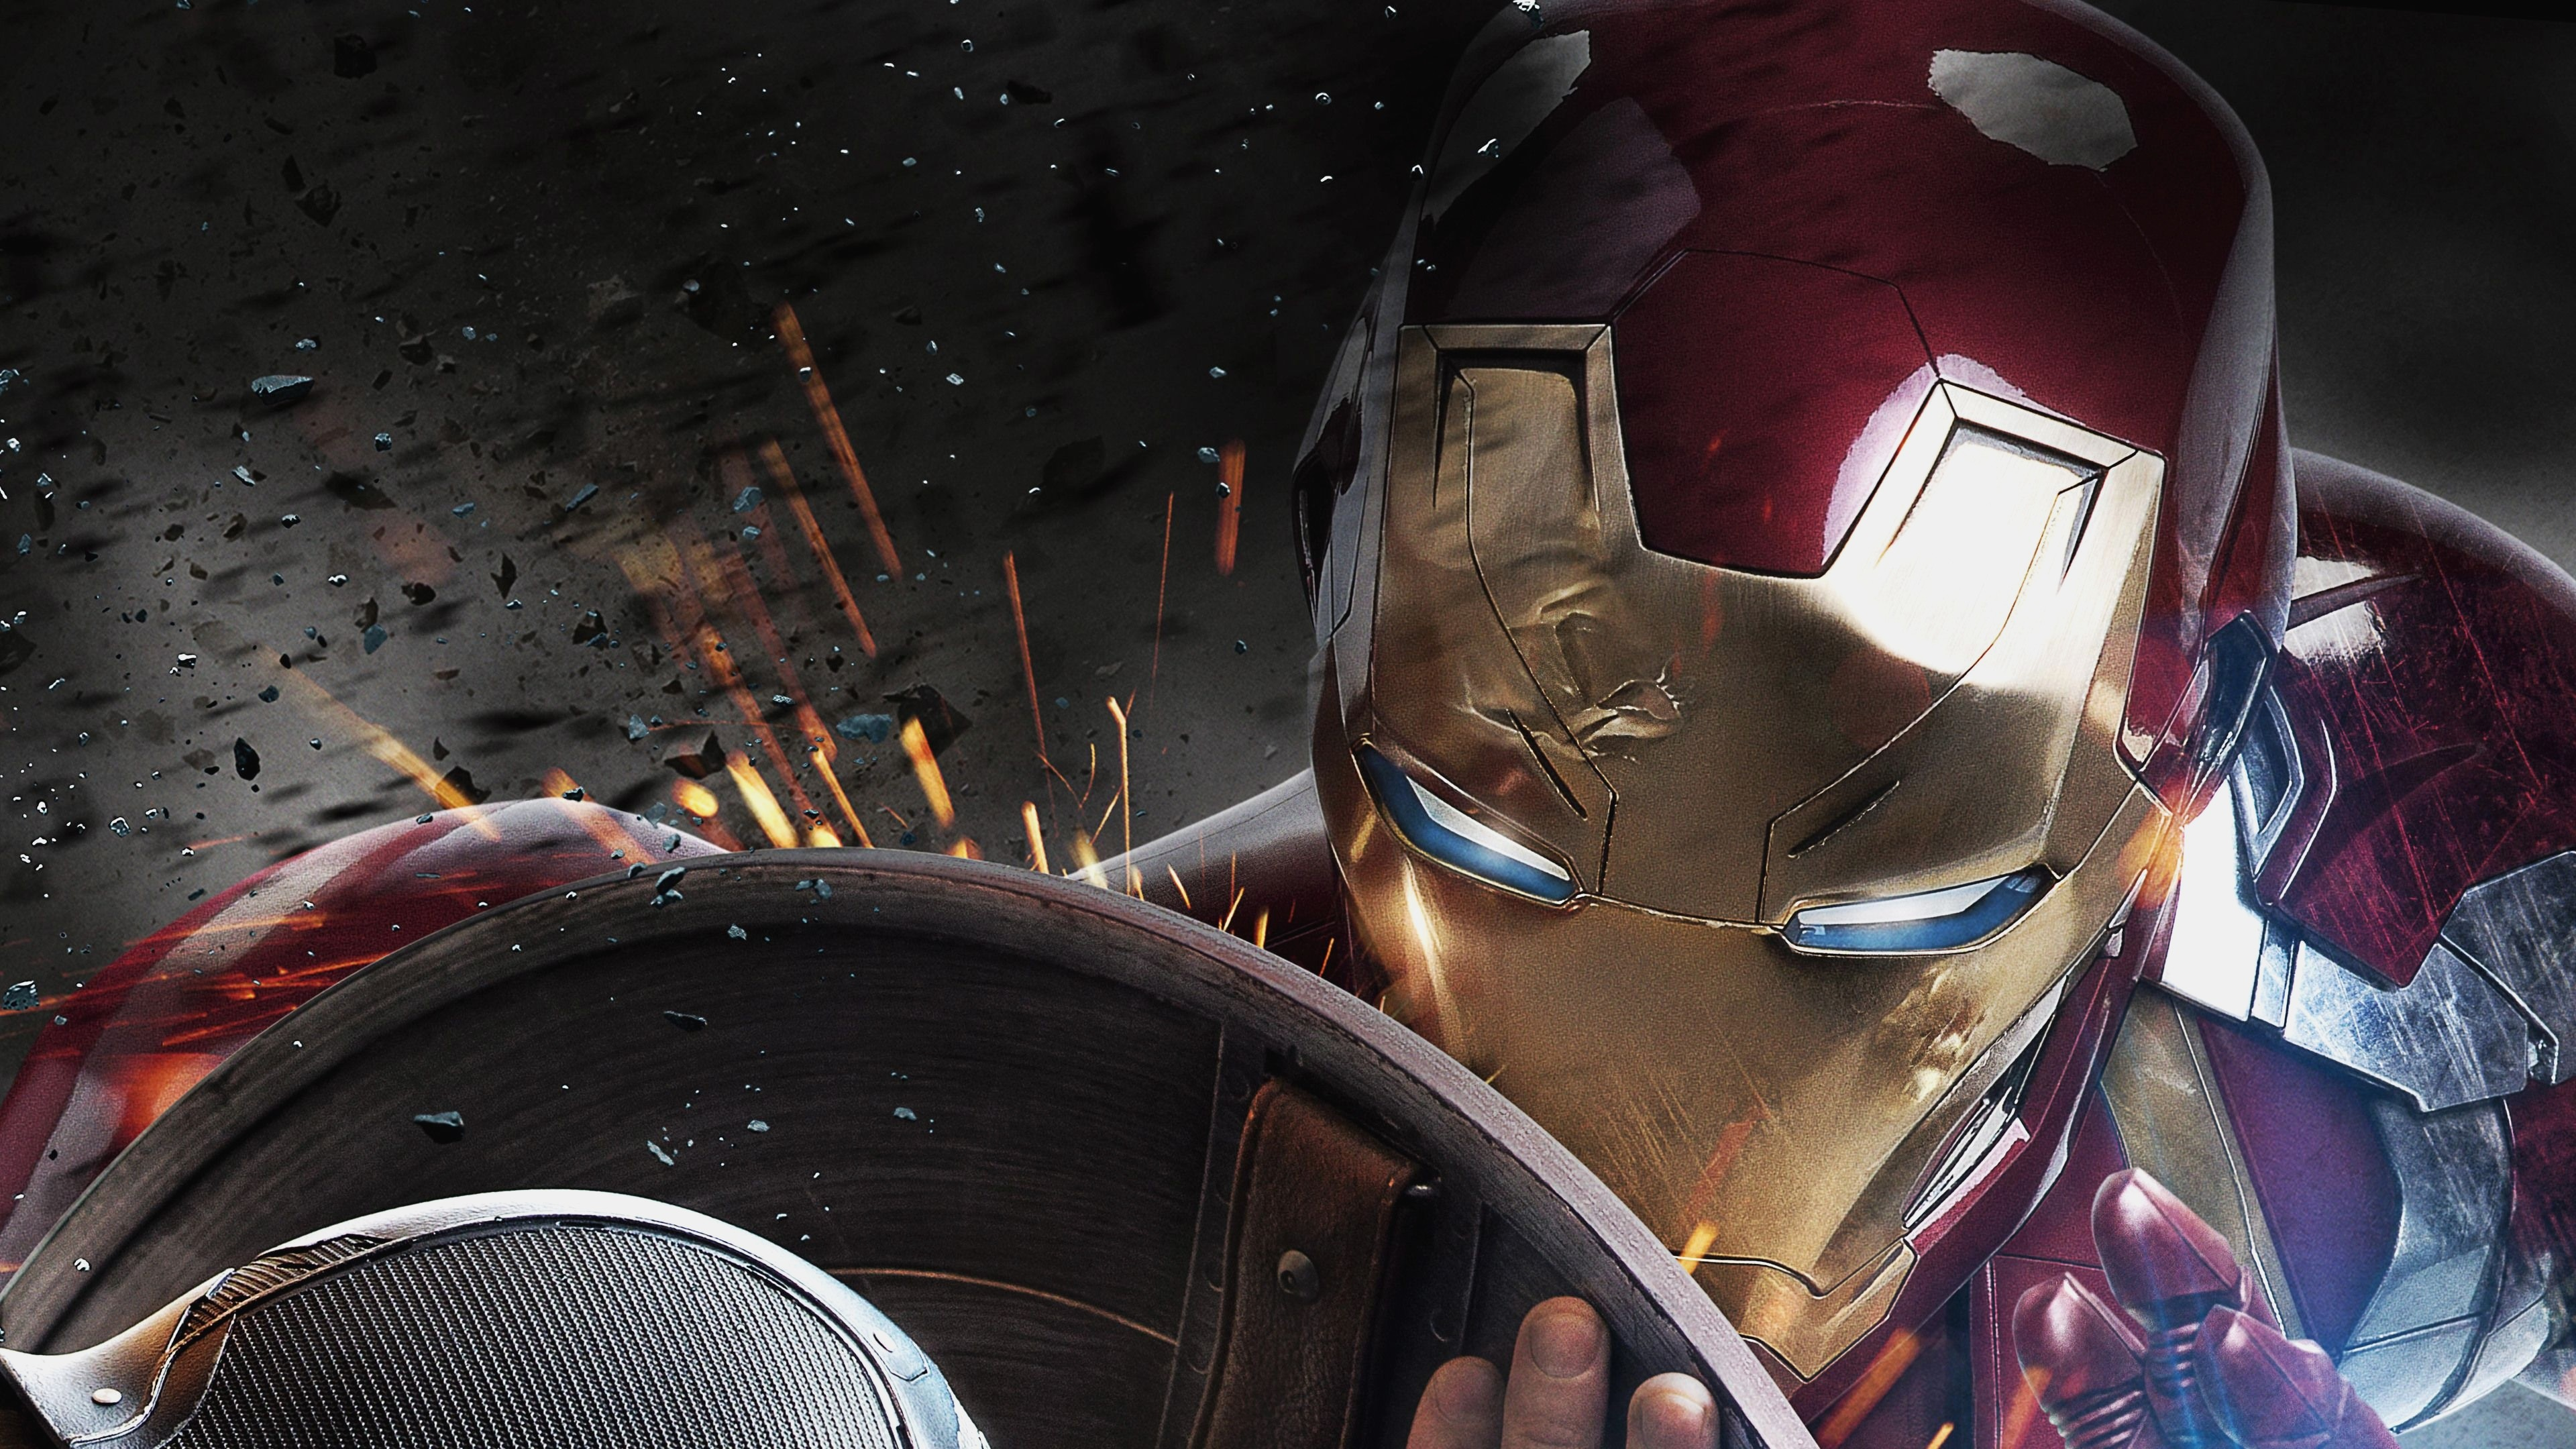 Res: 3840x2160, Iron Man 4k superheroes wallpapers iron man wallpapers hd wallpapers 8k  wallpapers 5k wallpapers